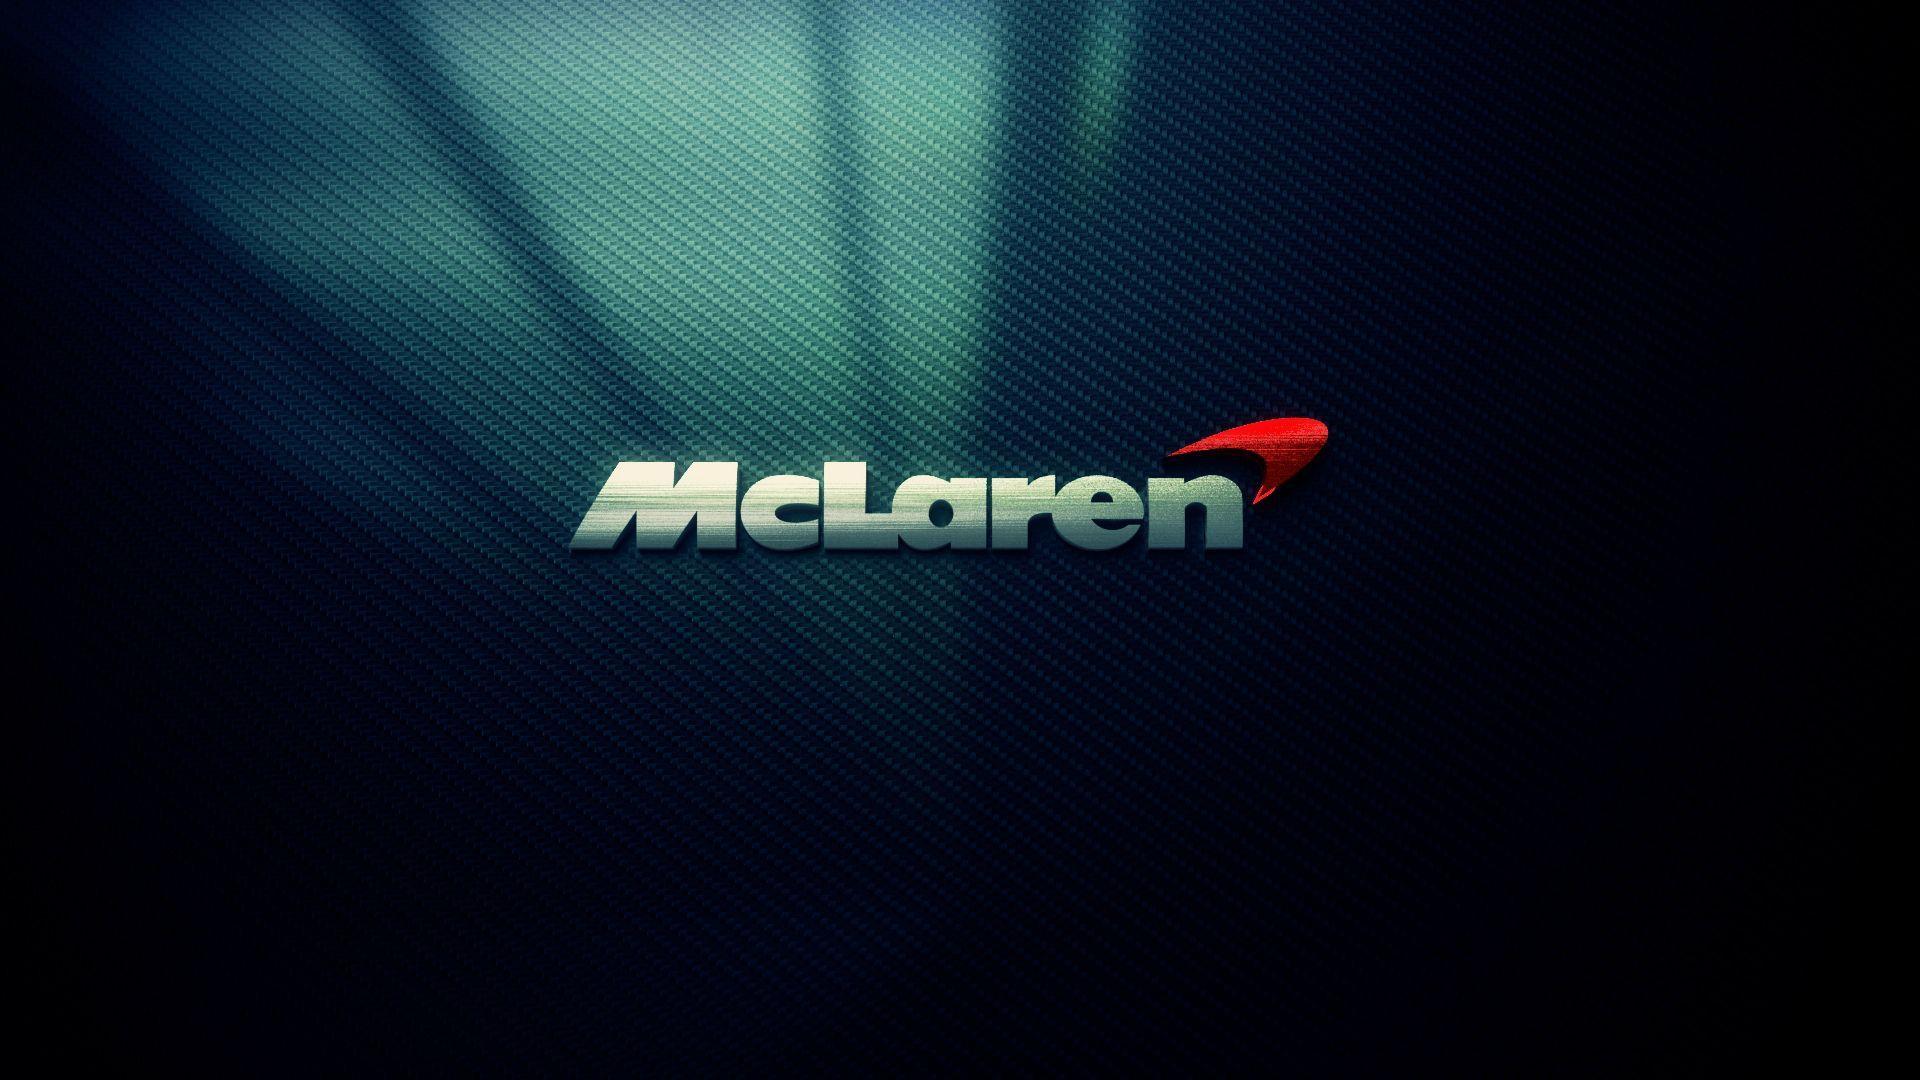 McLaren Logo images for desktop and wallpaper